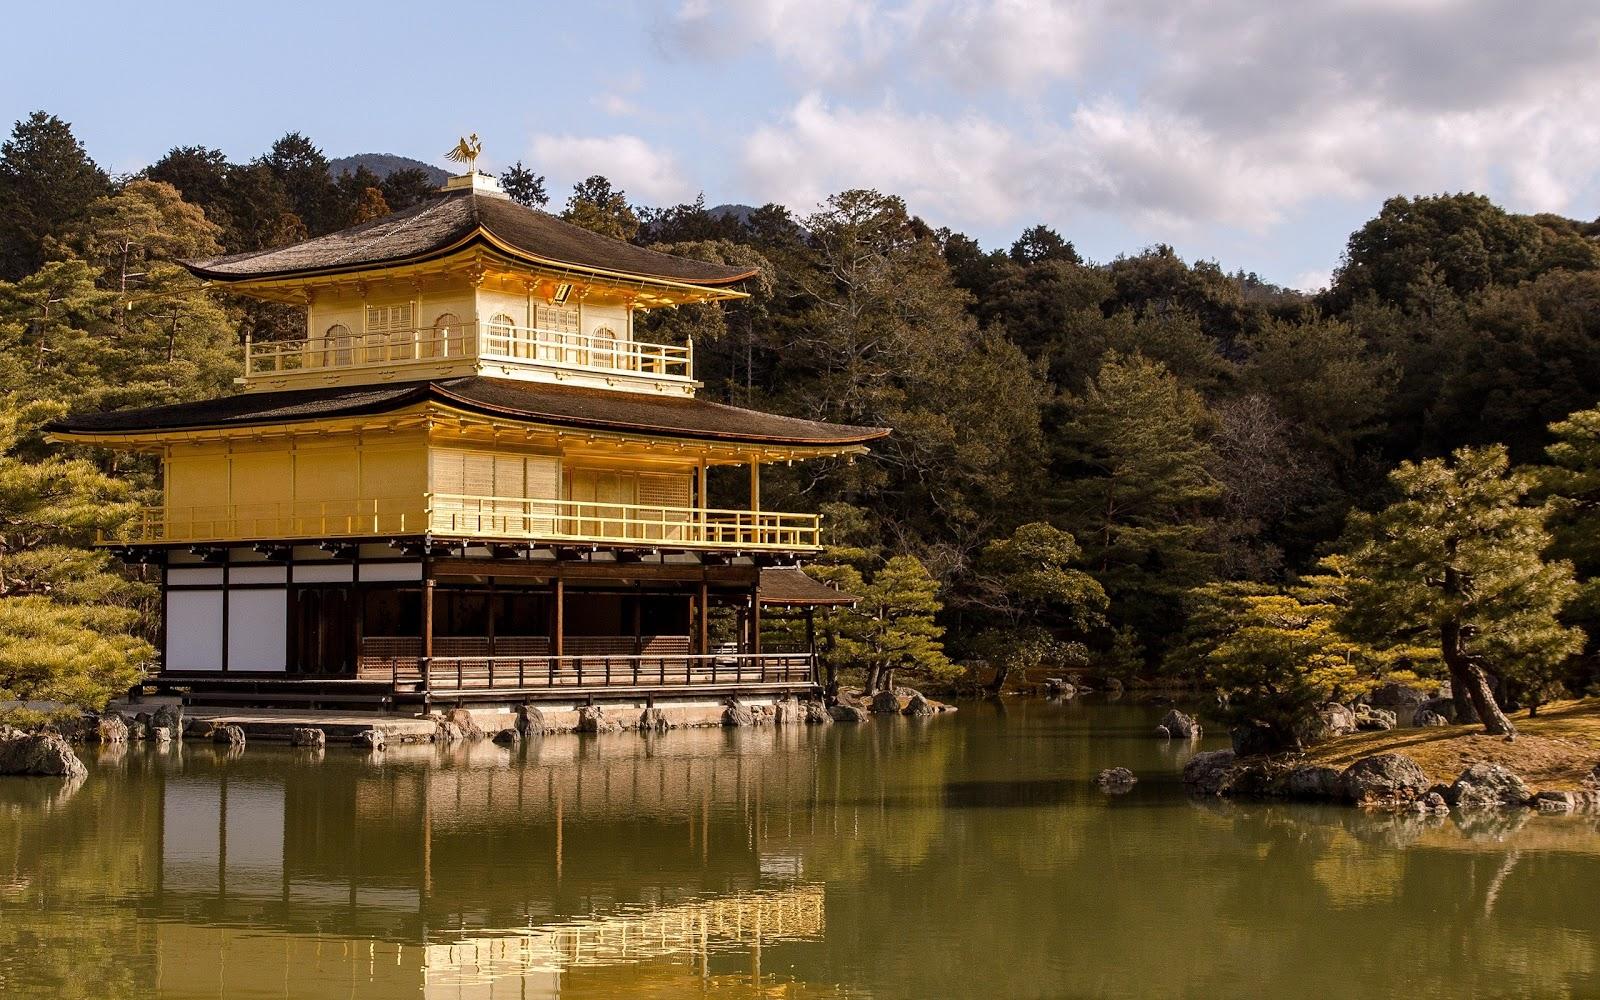 http://2.bp.blogspot.com/-EFx2MKIcQd4/T46CdIV2-EI/AAAAAAAADR0/ul8C0au-Q1E/s1600/japanese-temple-windows-8-wallpaper-2560x1600.jpg